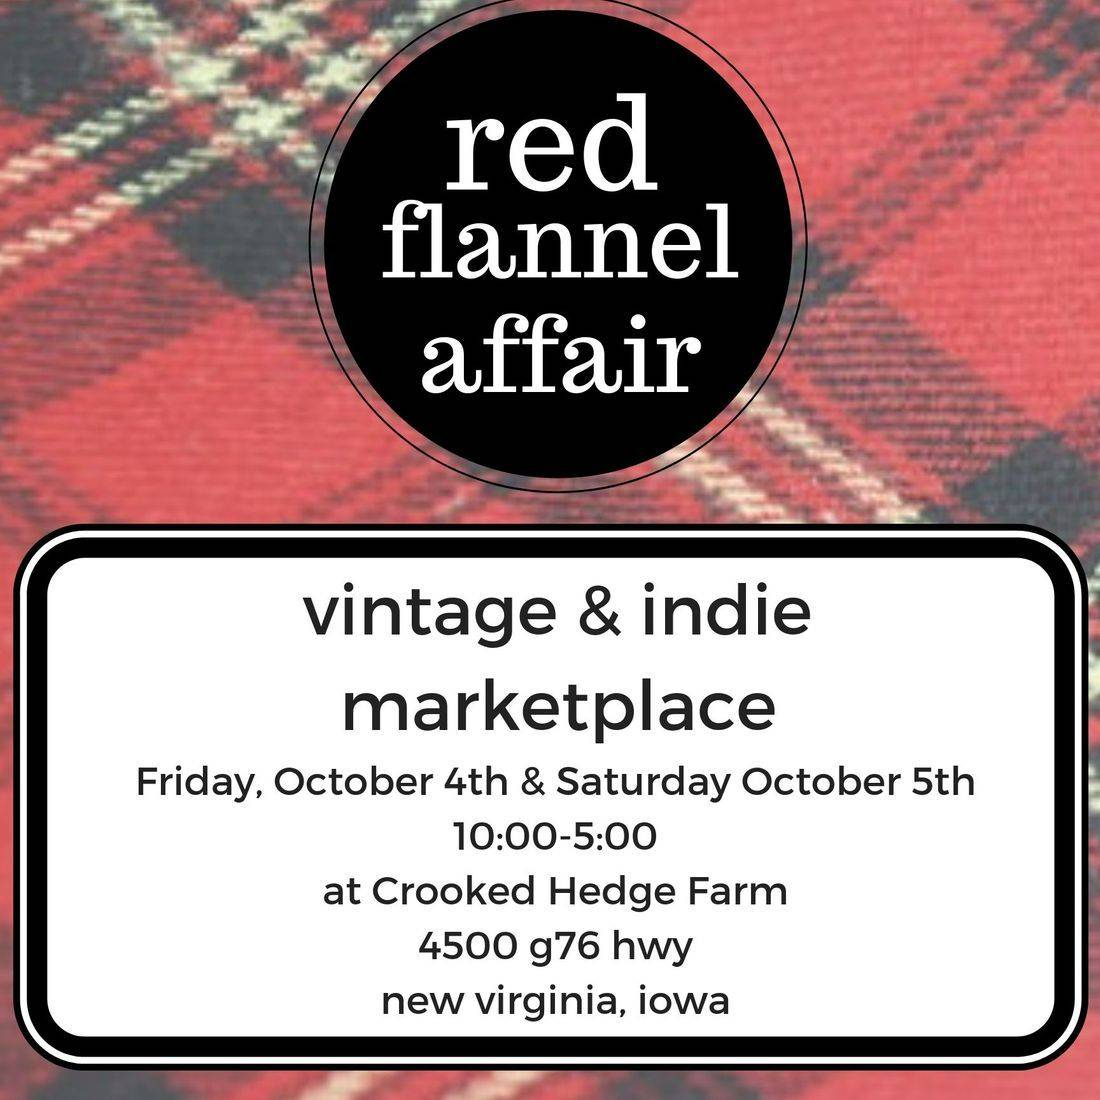 Red Flannel Affair